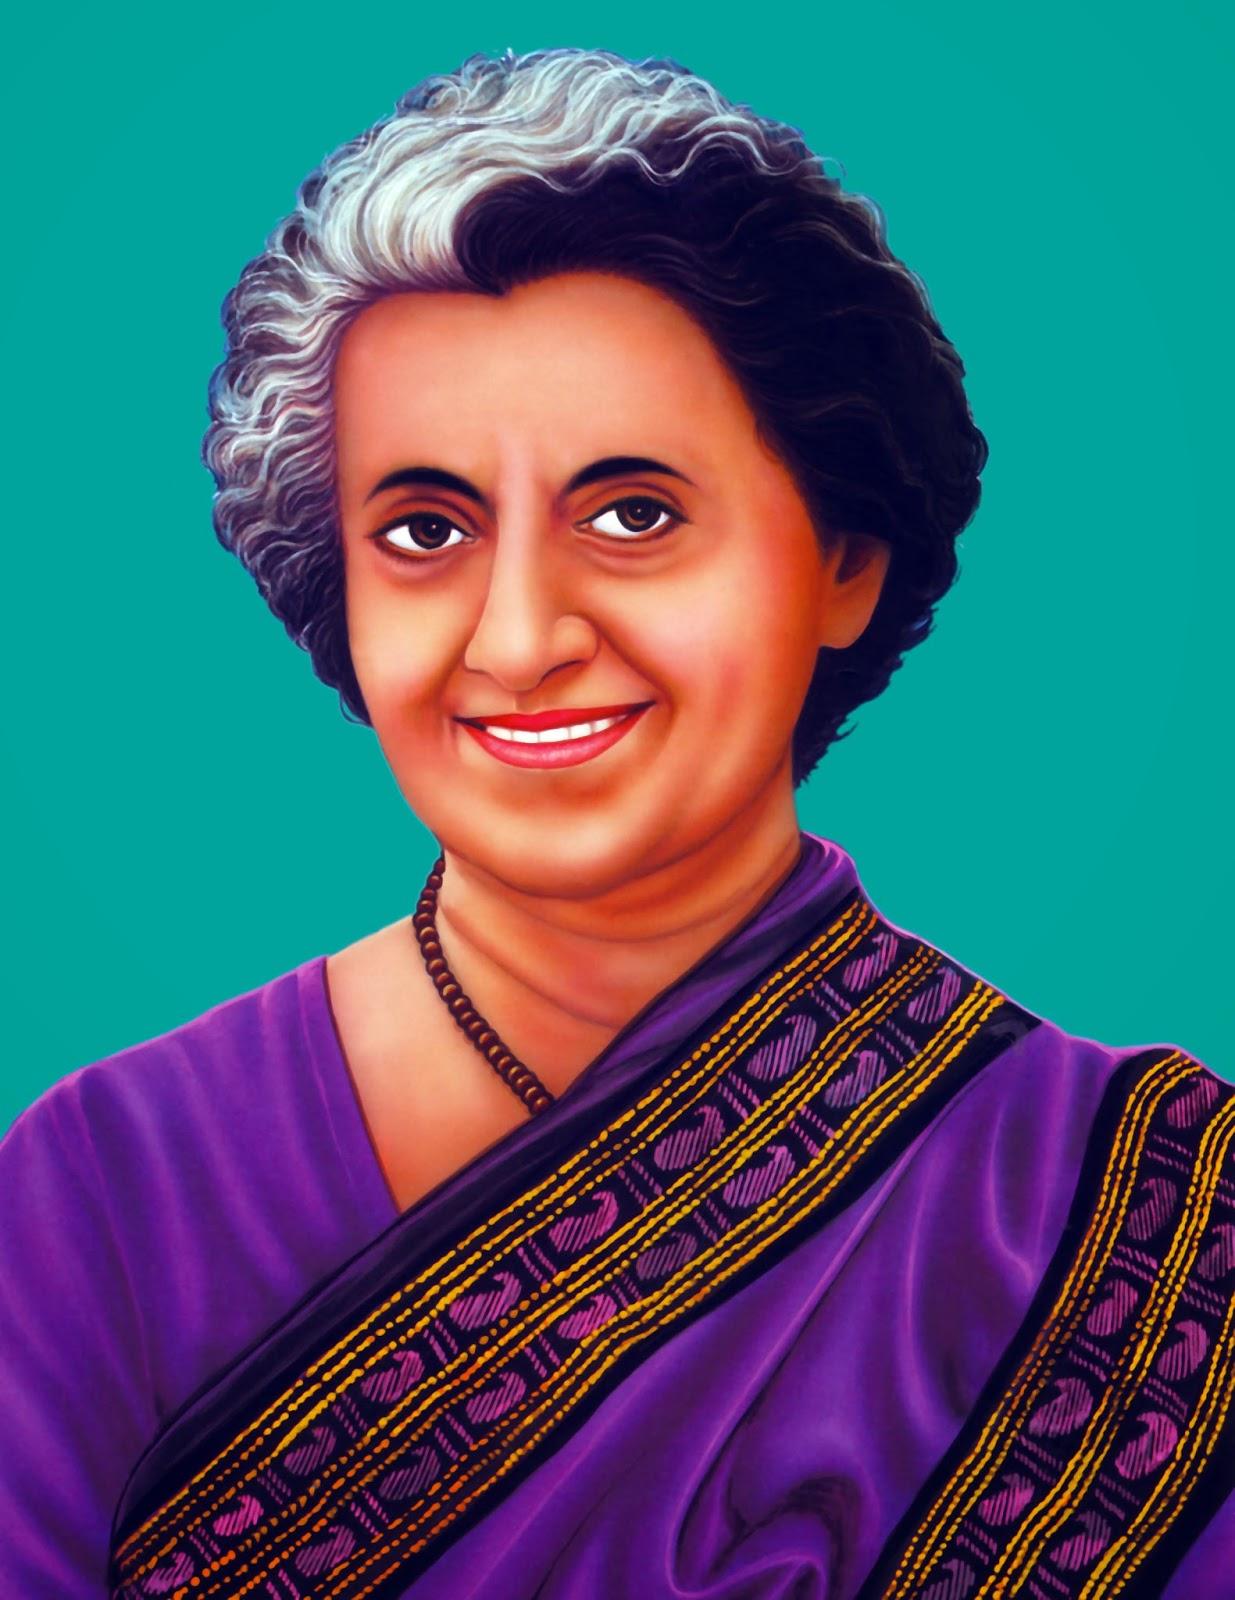 CLIP ARTS AND IMAGES OF INDIA: Indira Gandhi.